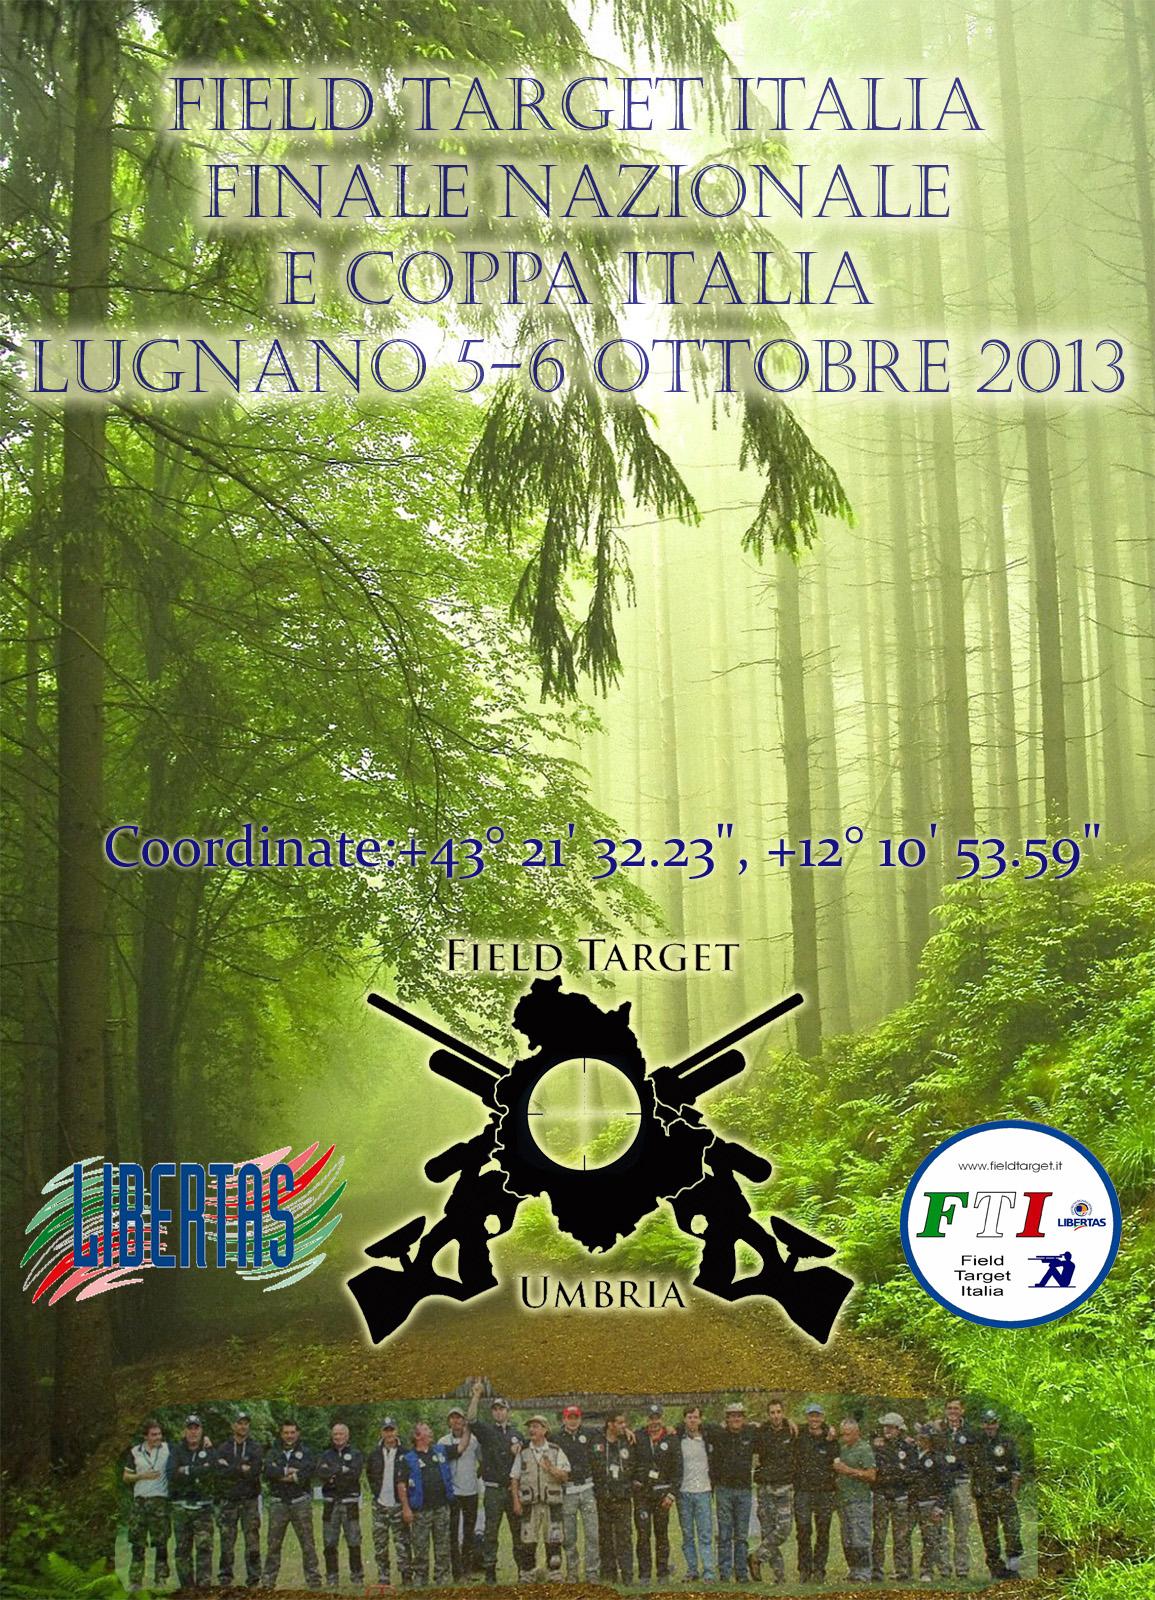 20130911231201_Locandina_Finale_ok